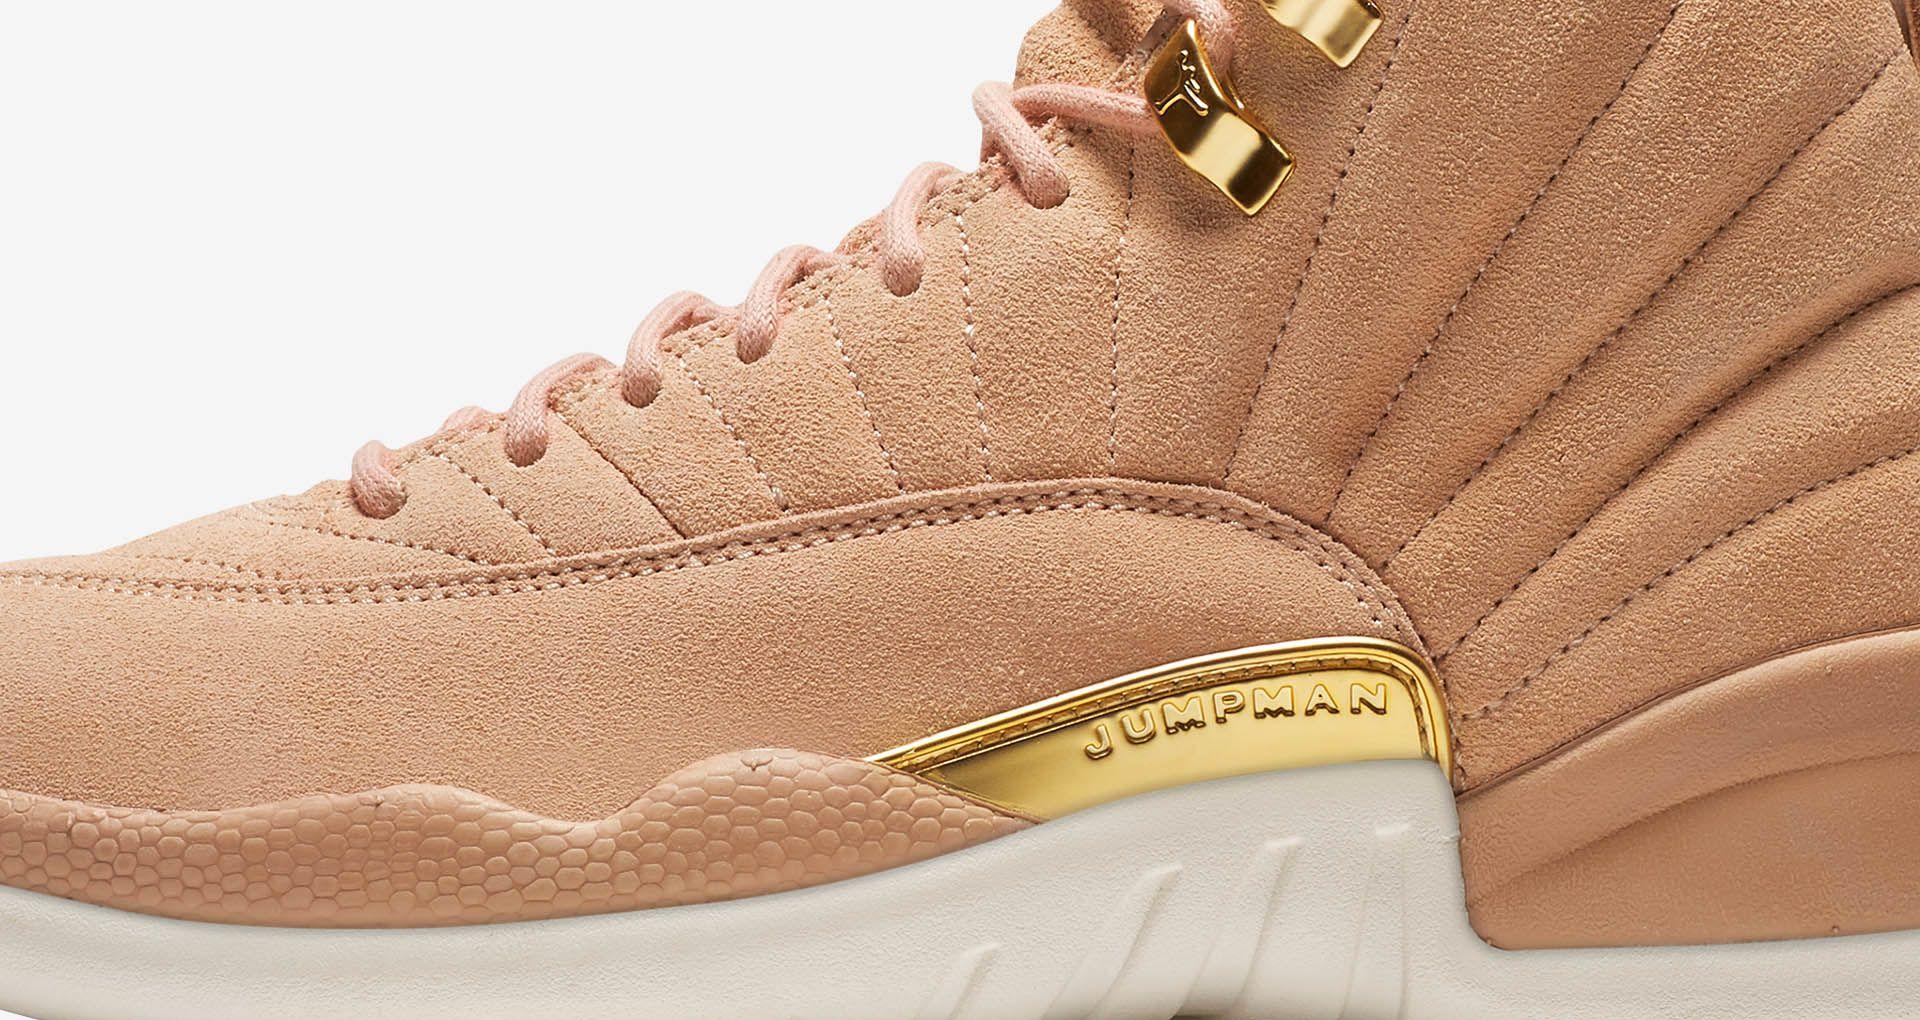 8fad13f1d7ca3a Women s Air Jordan 12  Vachetta Tan   Metallic Gold  Release Date ...